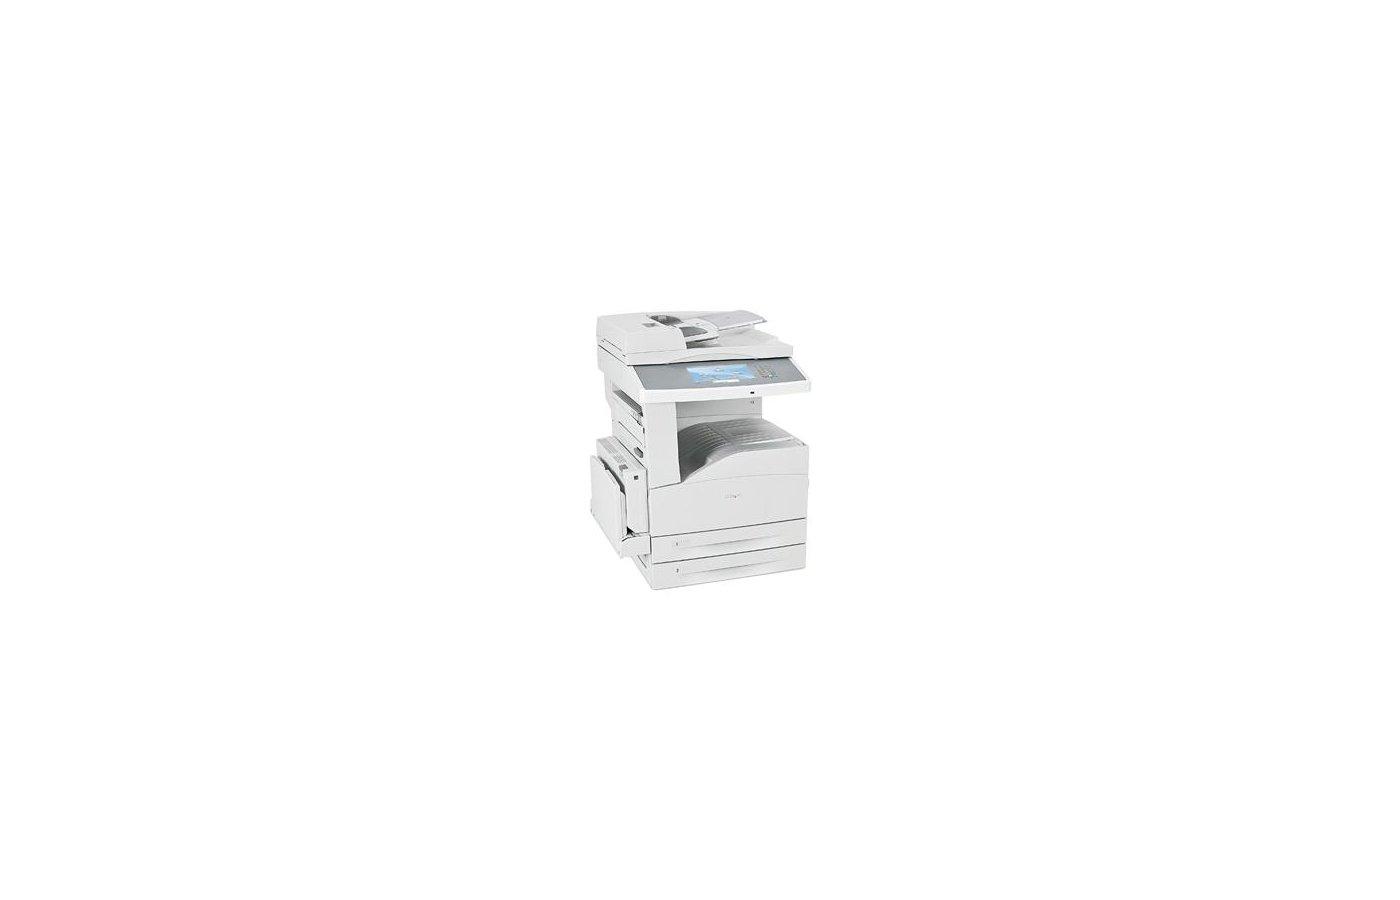 МФУ Lexmark X862de3 /19Z0191/